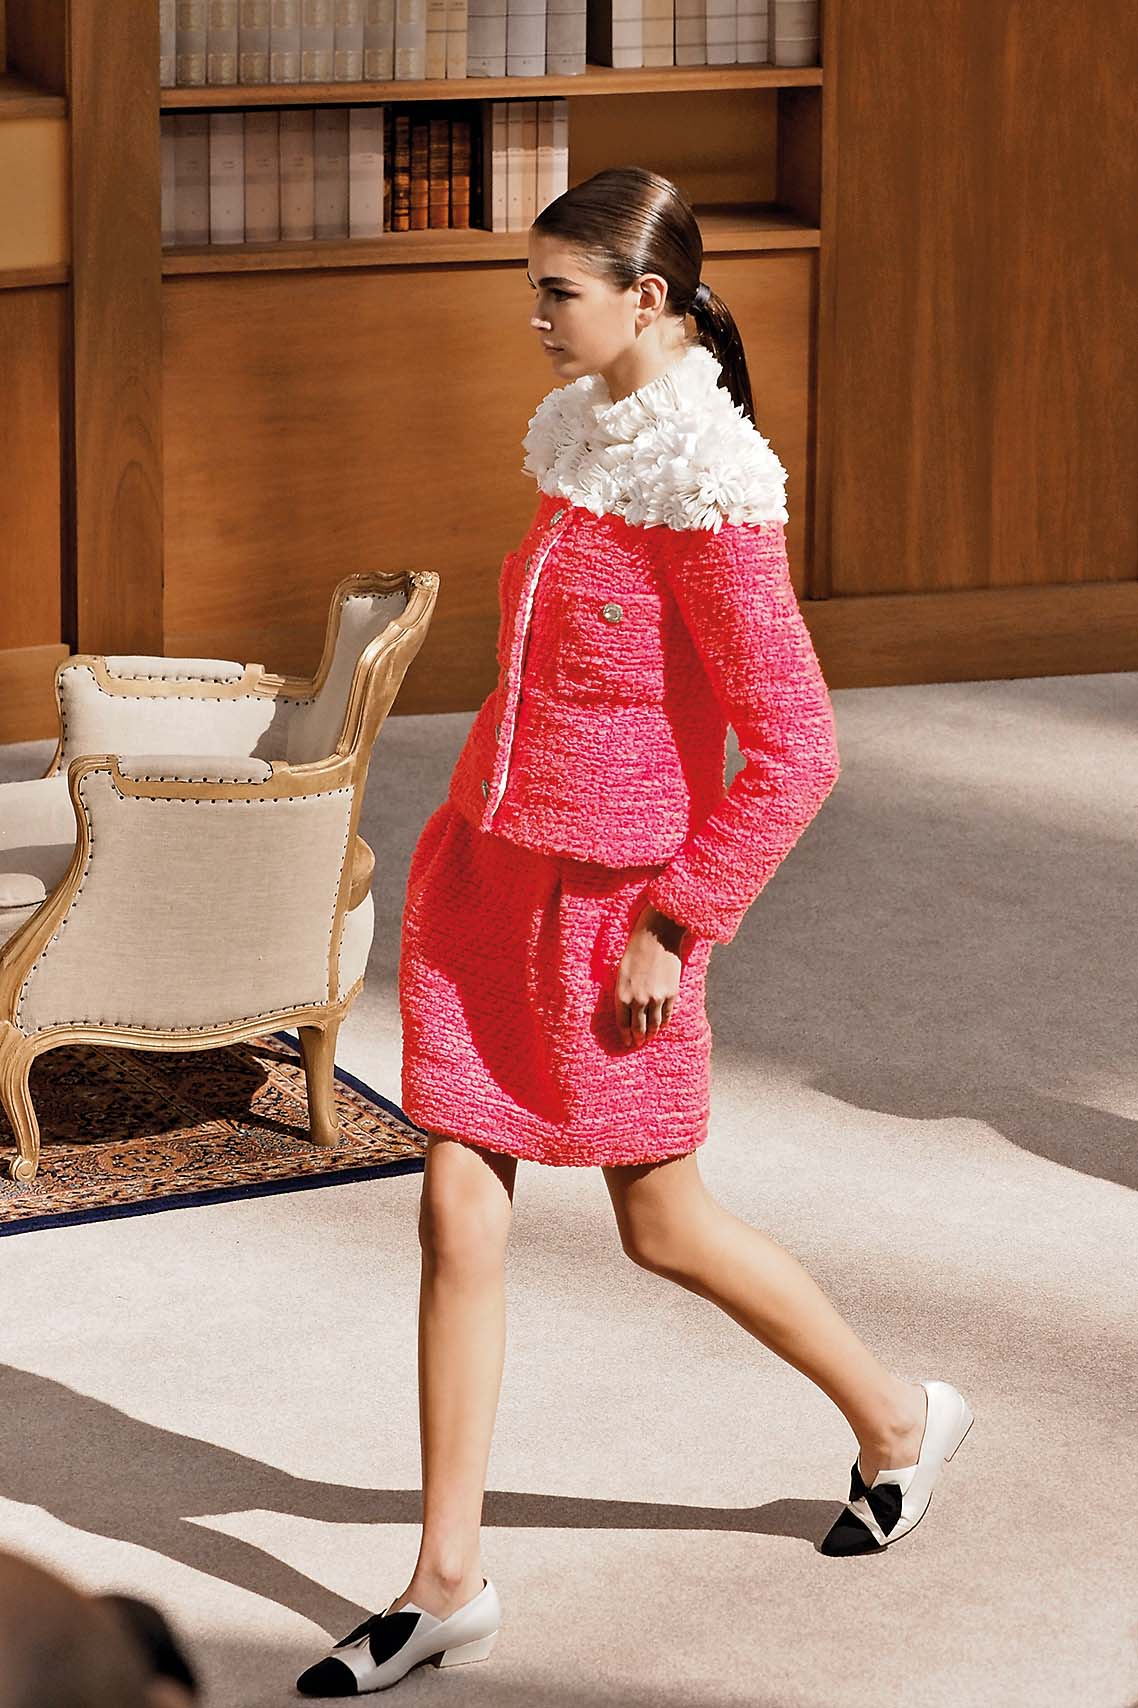 Model on the catwalk during Chanel show Fall Winter 2019, Haute Couture Fashion Week in Paris//03VULAURENT_vu01967/1907021253/Credit:LAURENT VU/SIPA/1907021258, Image: 453516791, License: Rights-managed, Restrictions: , Model Release: no, Credit line: LAURENT LAURENT VU / Sipa Press / Profimedia